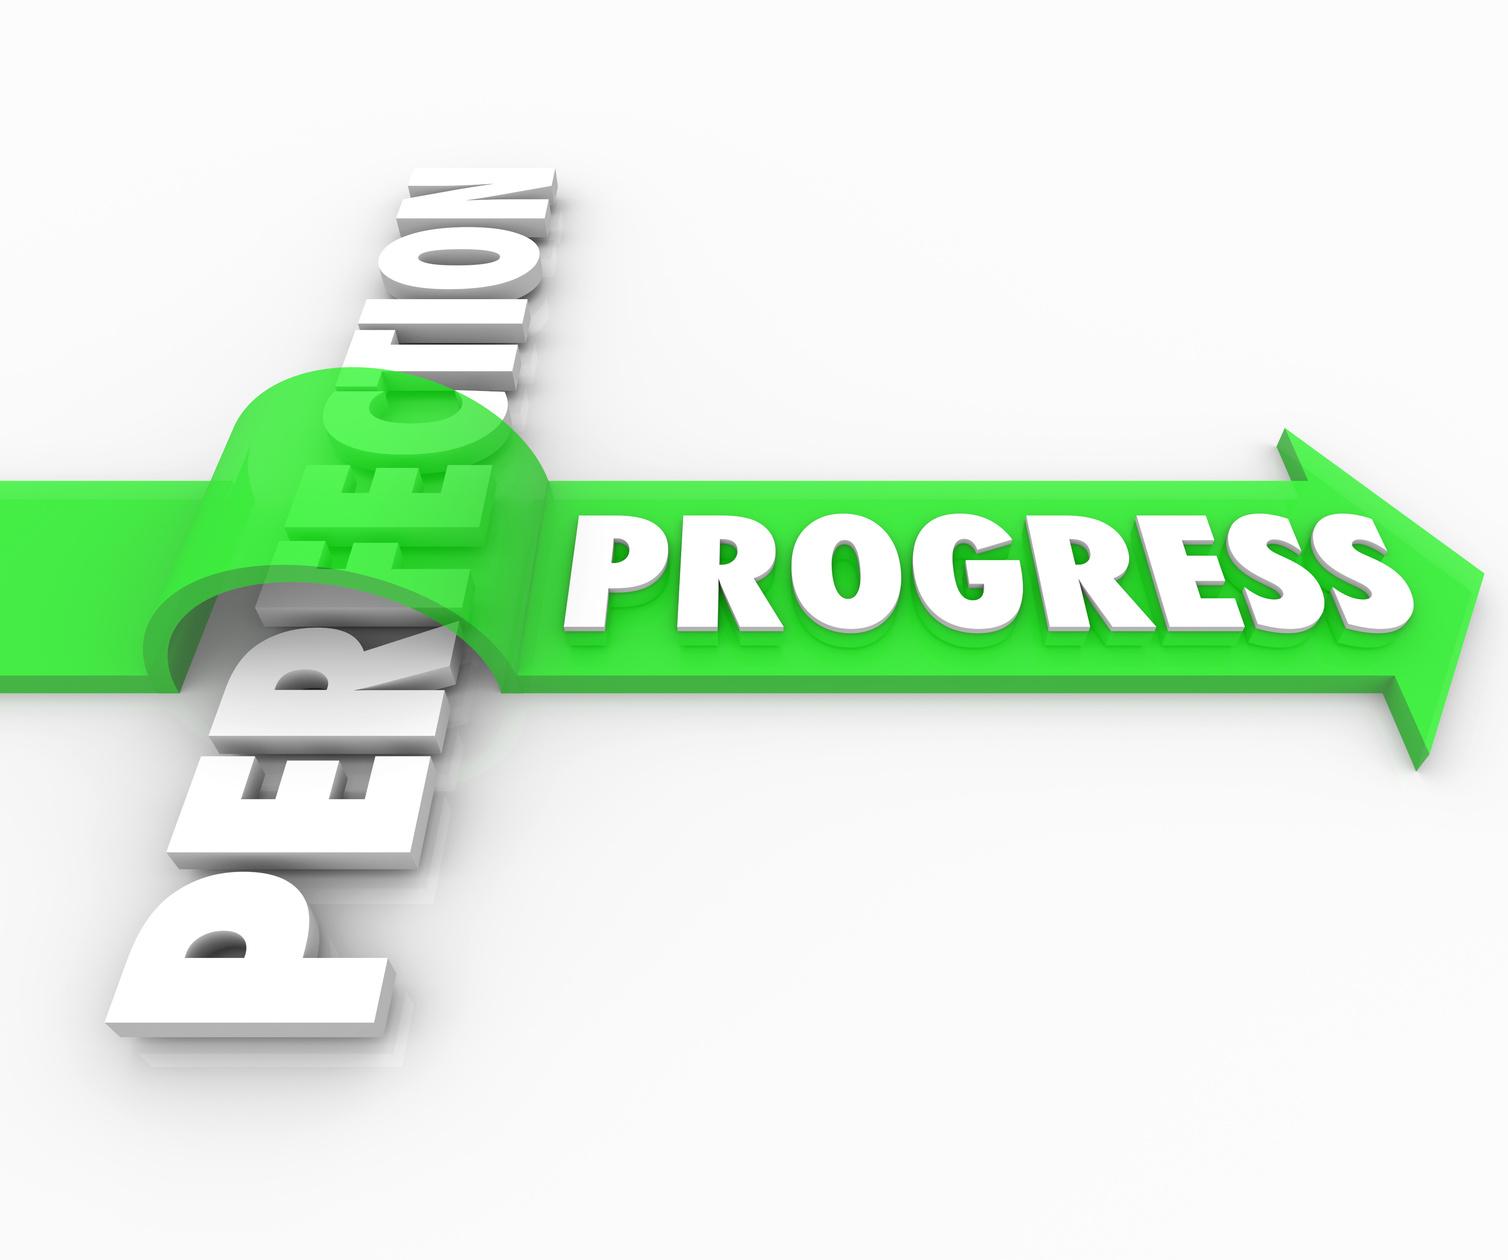 forex perfection versus progress